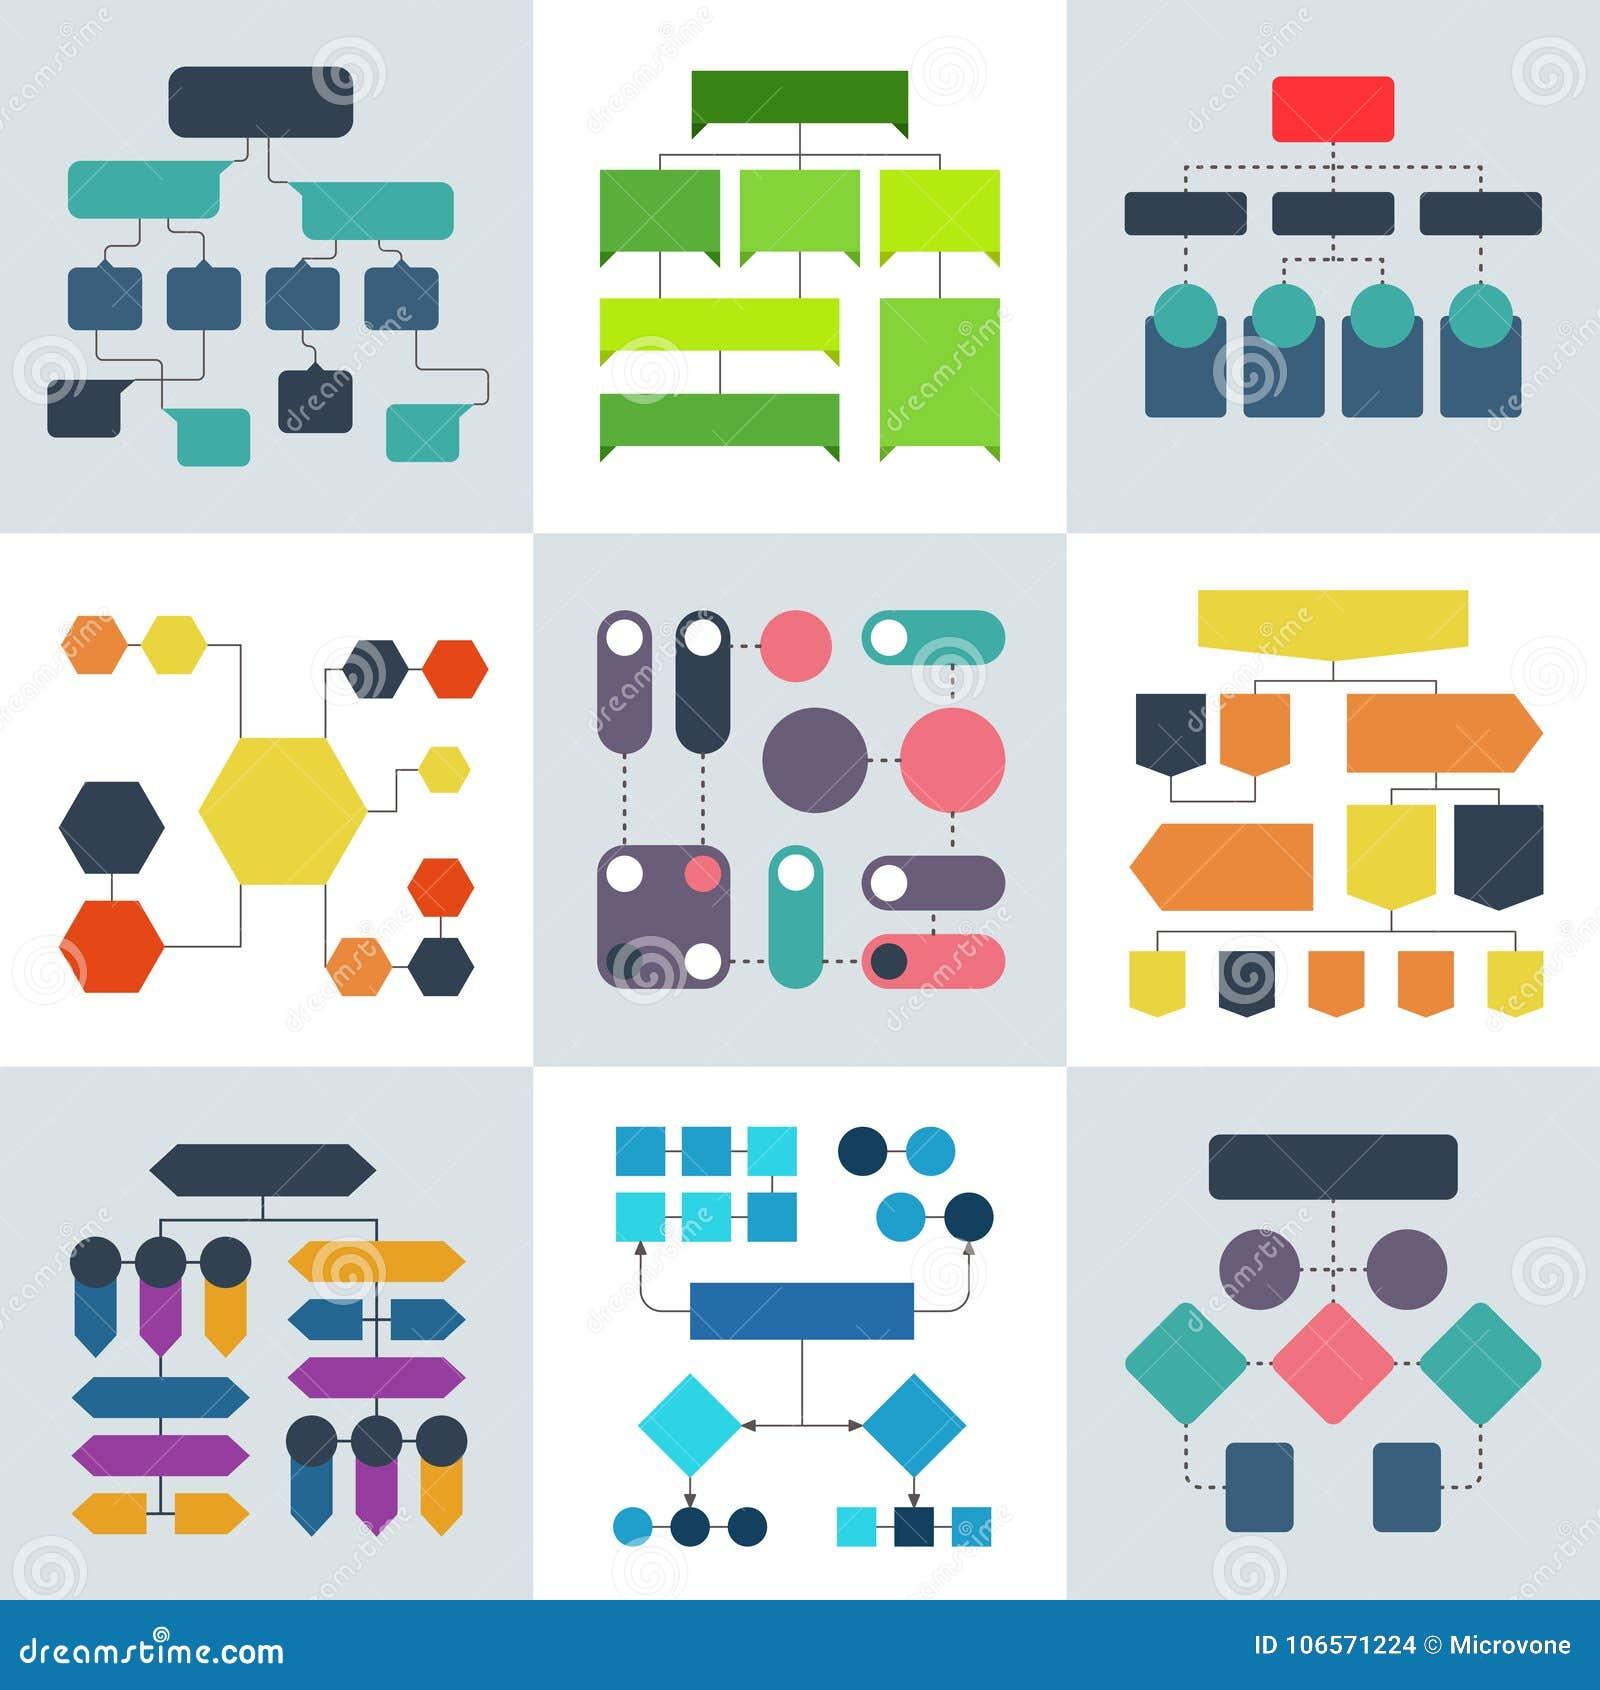 Fluxograma, fluxogramas e estruturas estruturais do processo de fluxo Elementos do infographics do vetor